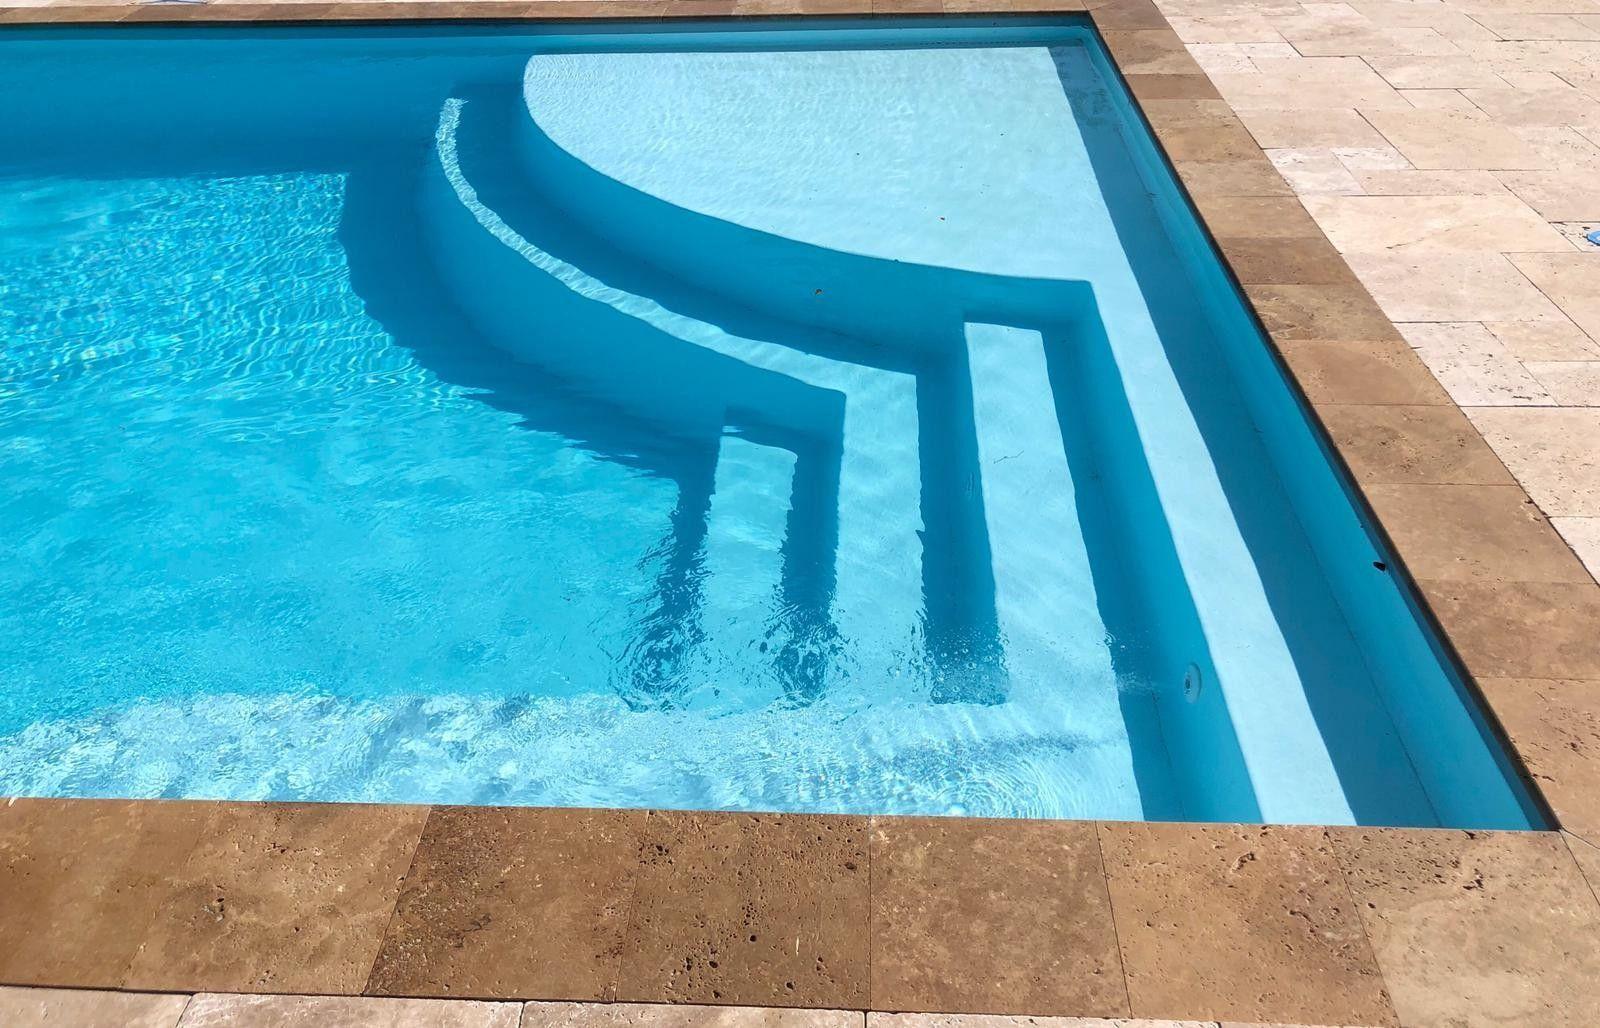 Pin By Melissa B Baker On Pool Ideas In 2020 Beach Entry Pool San Juan Pools Inground Fiberglass Pools